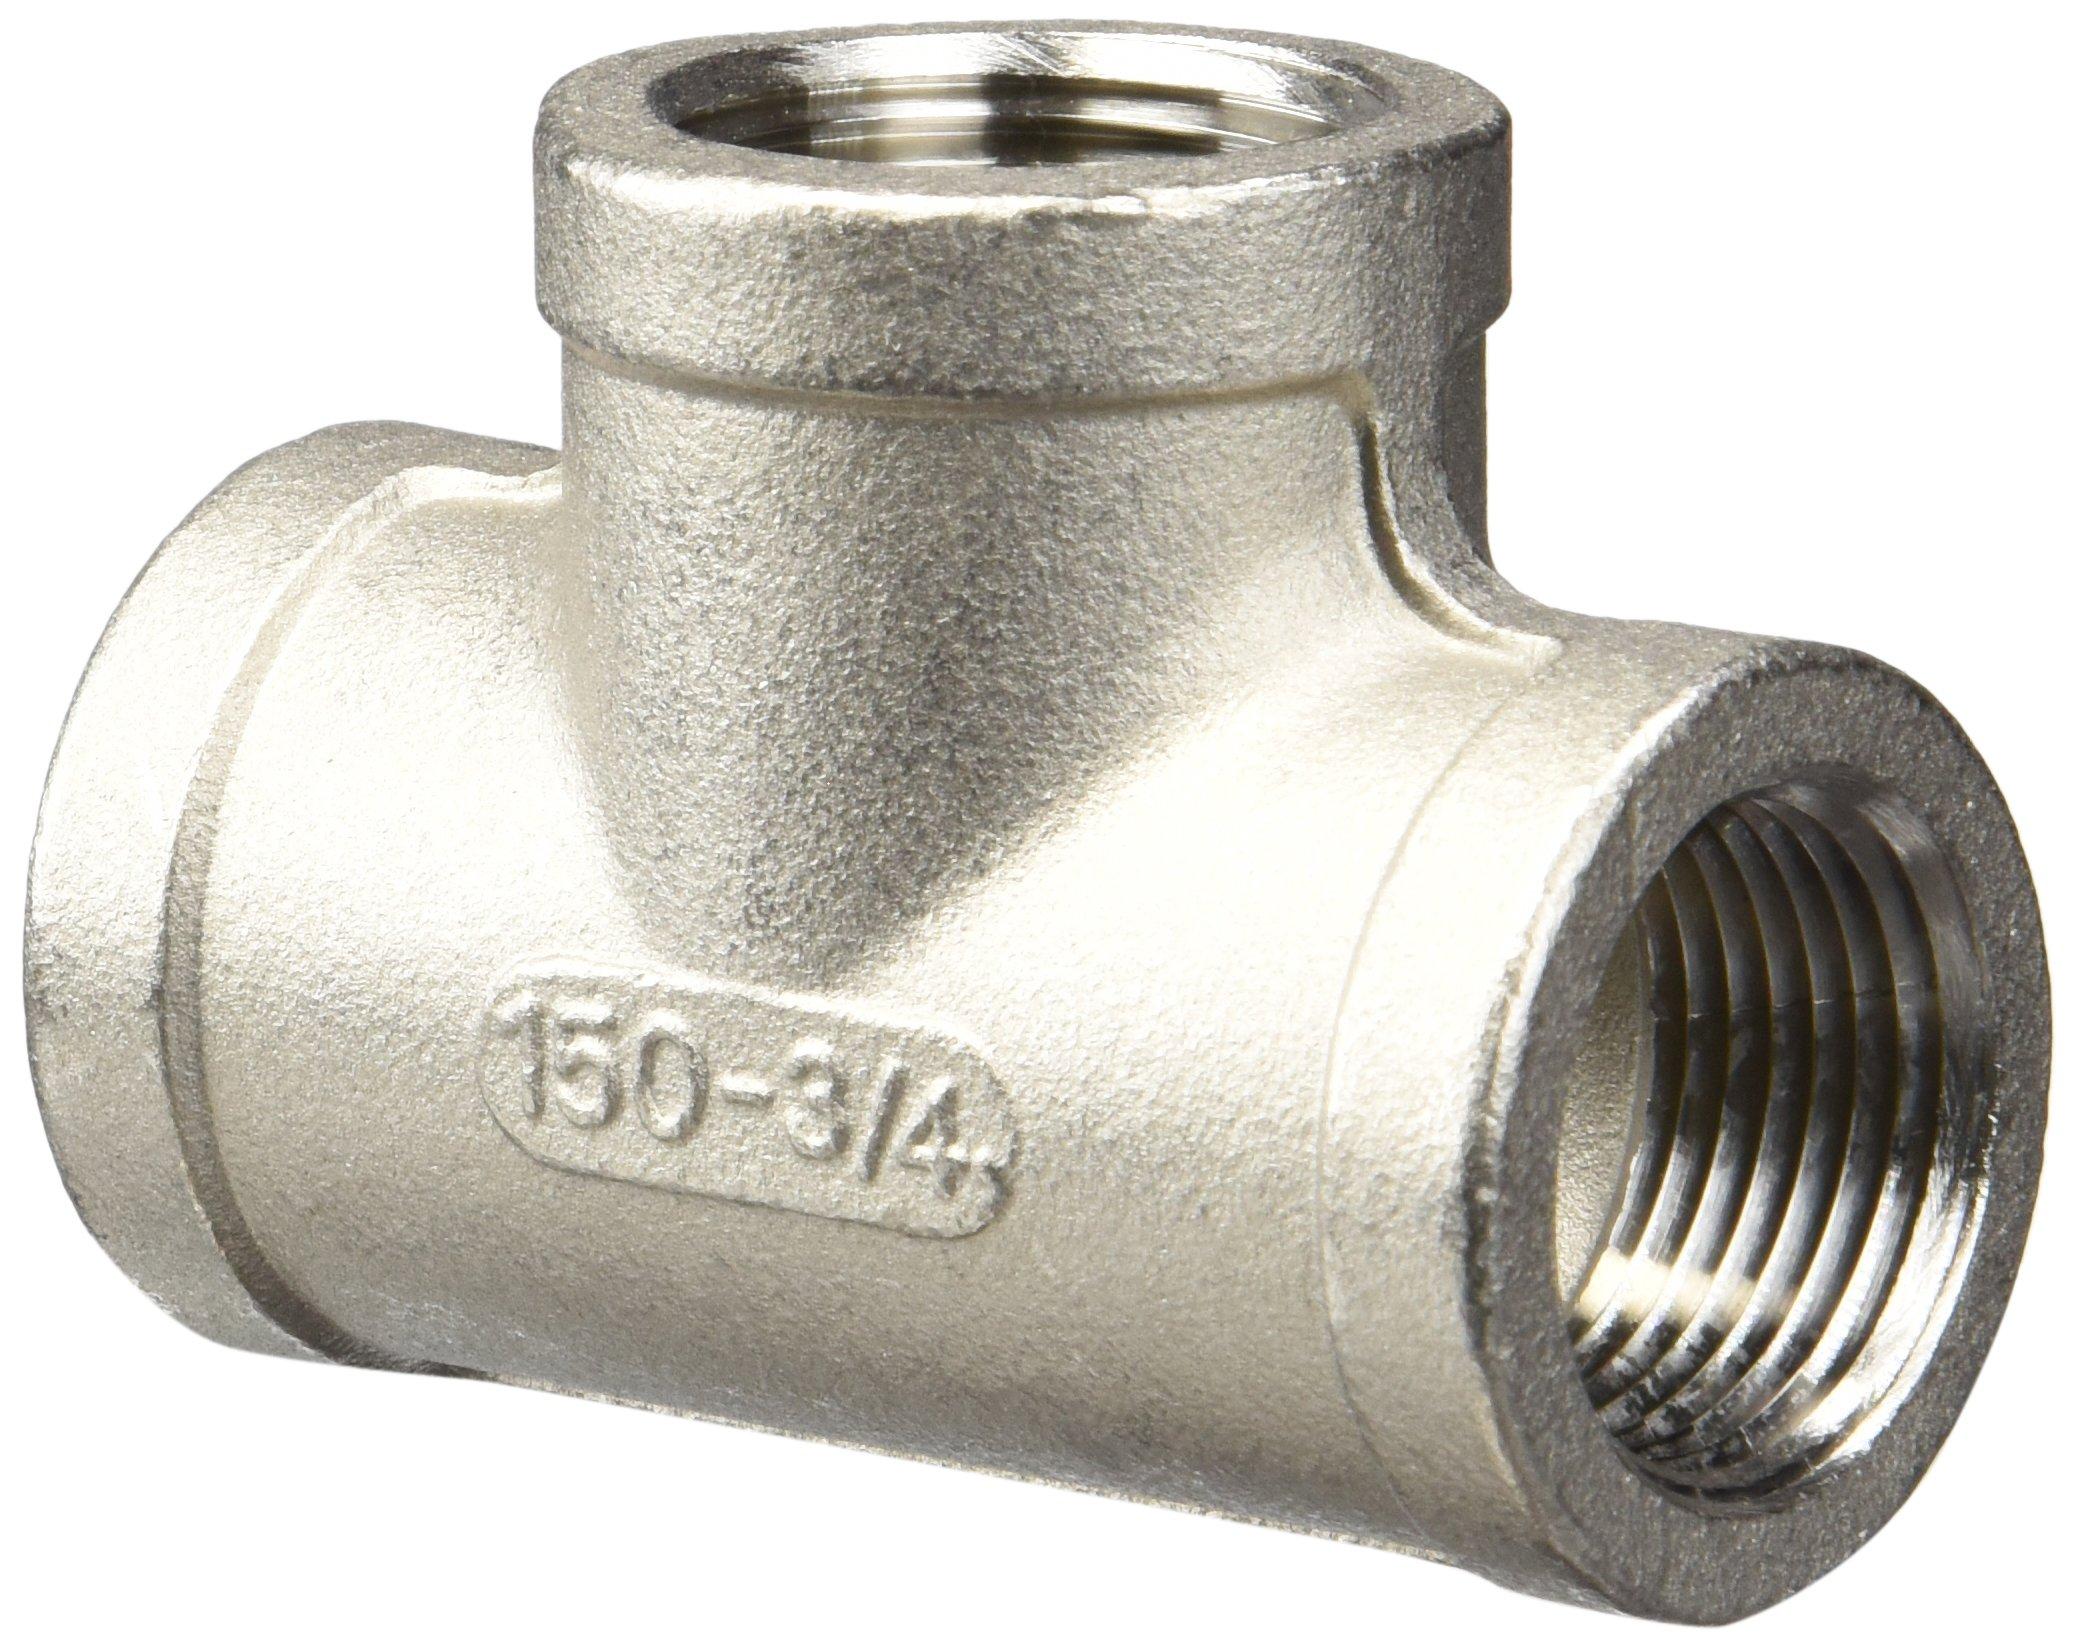 Merit Brass K606-12 Stainless Steel 316 Cast Pipe Fitting, Tee, Class 150, 3/4'' NPT Female (Pack of 25)